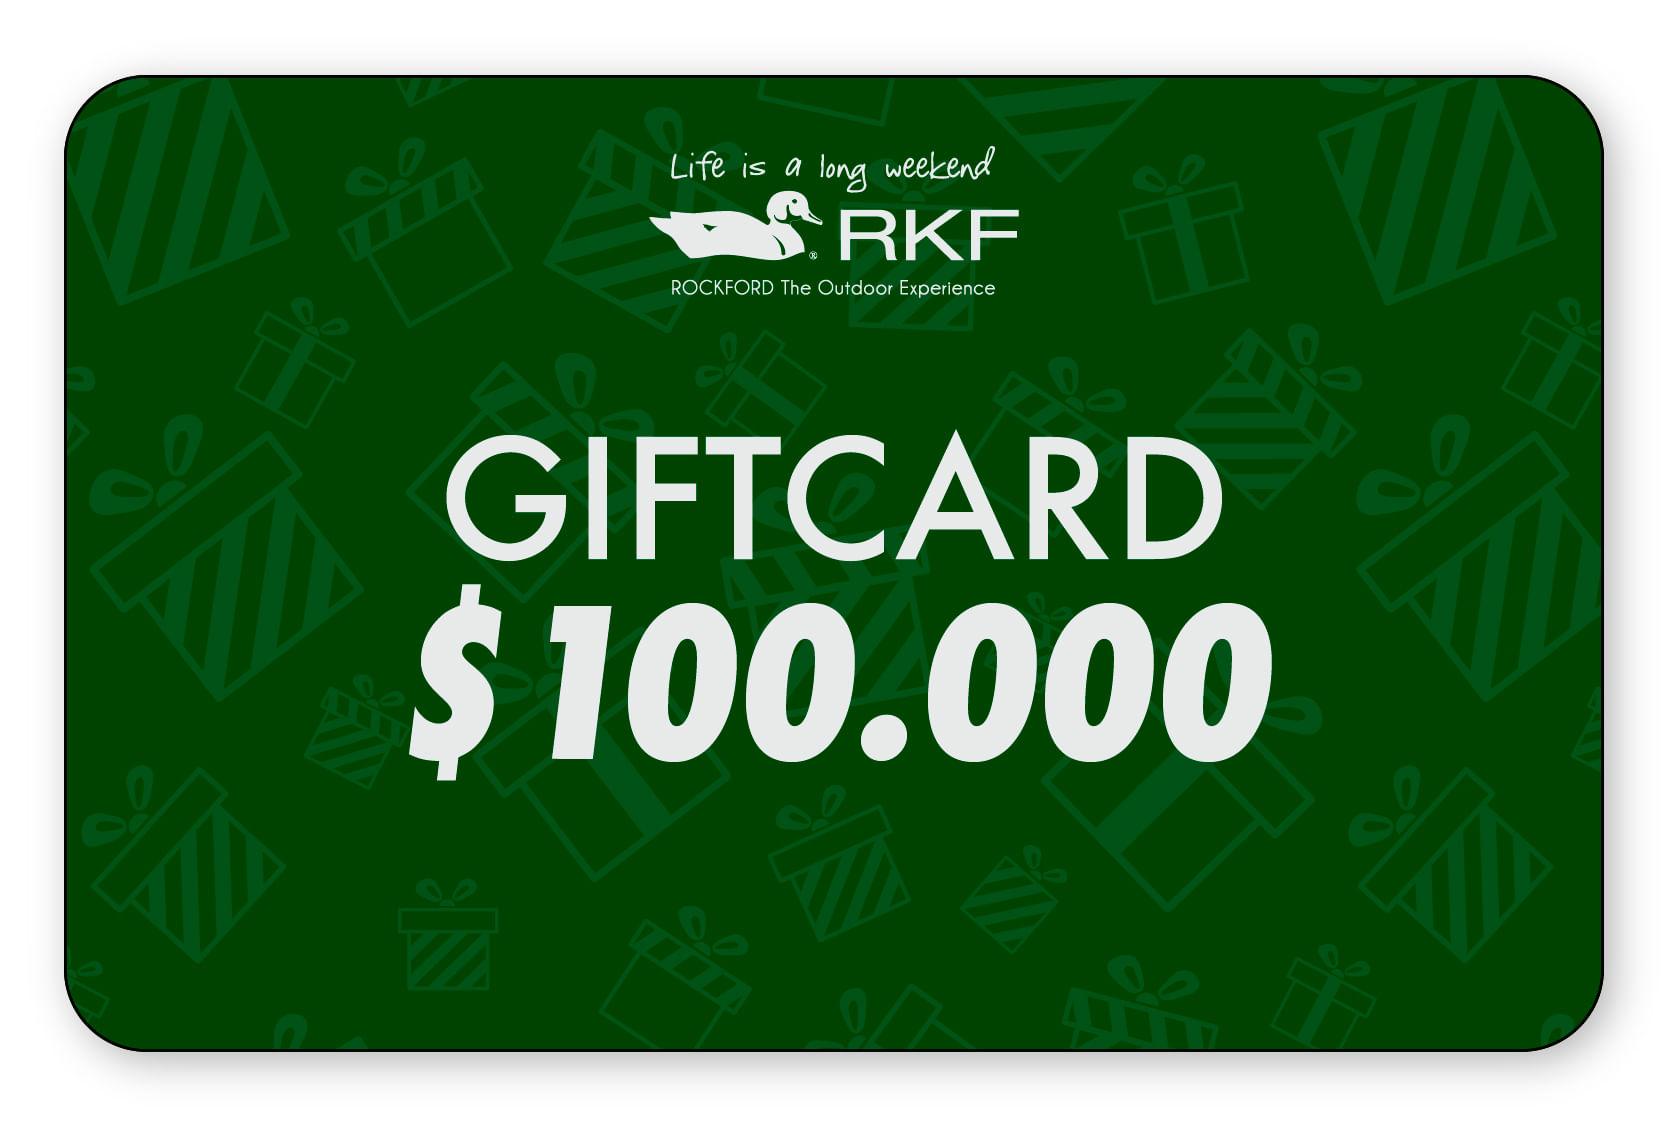 Gift Card $100.000